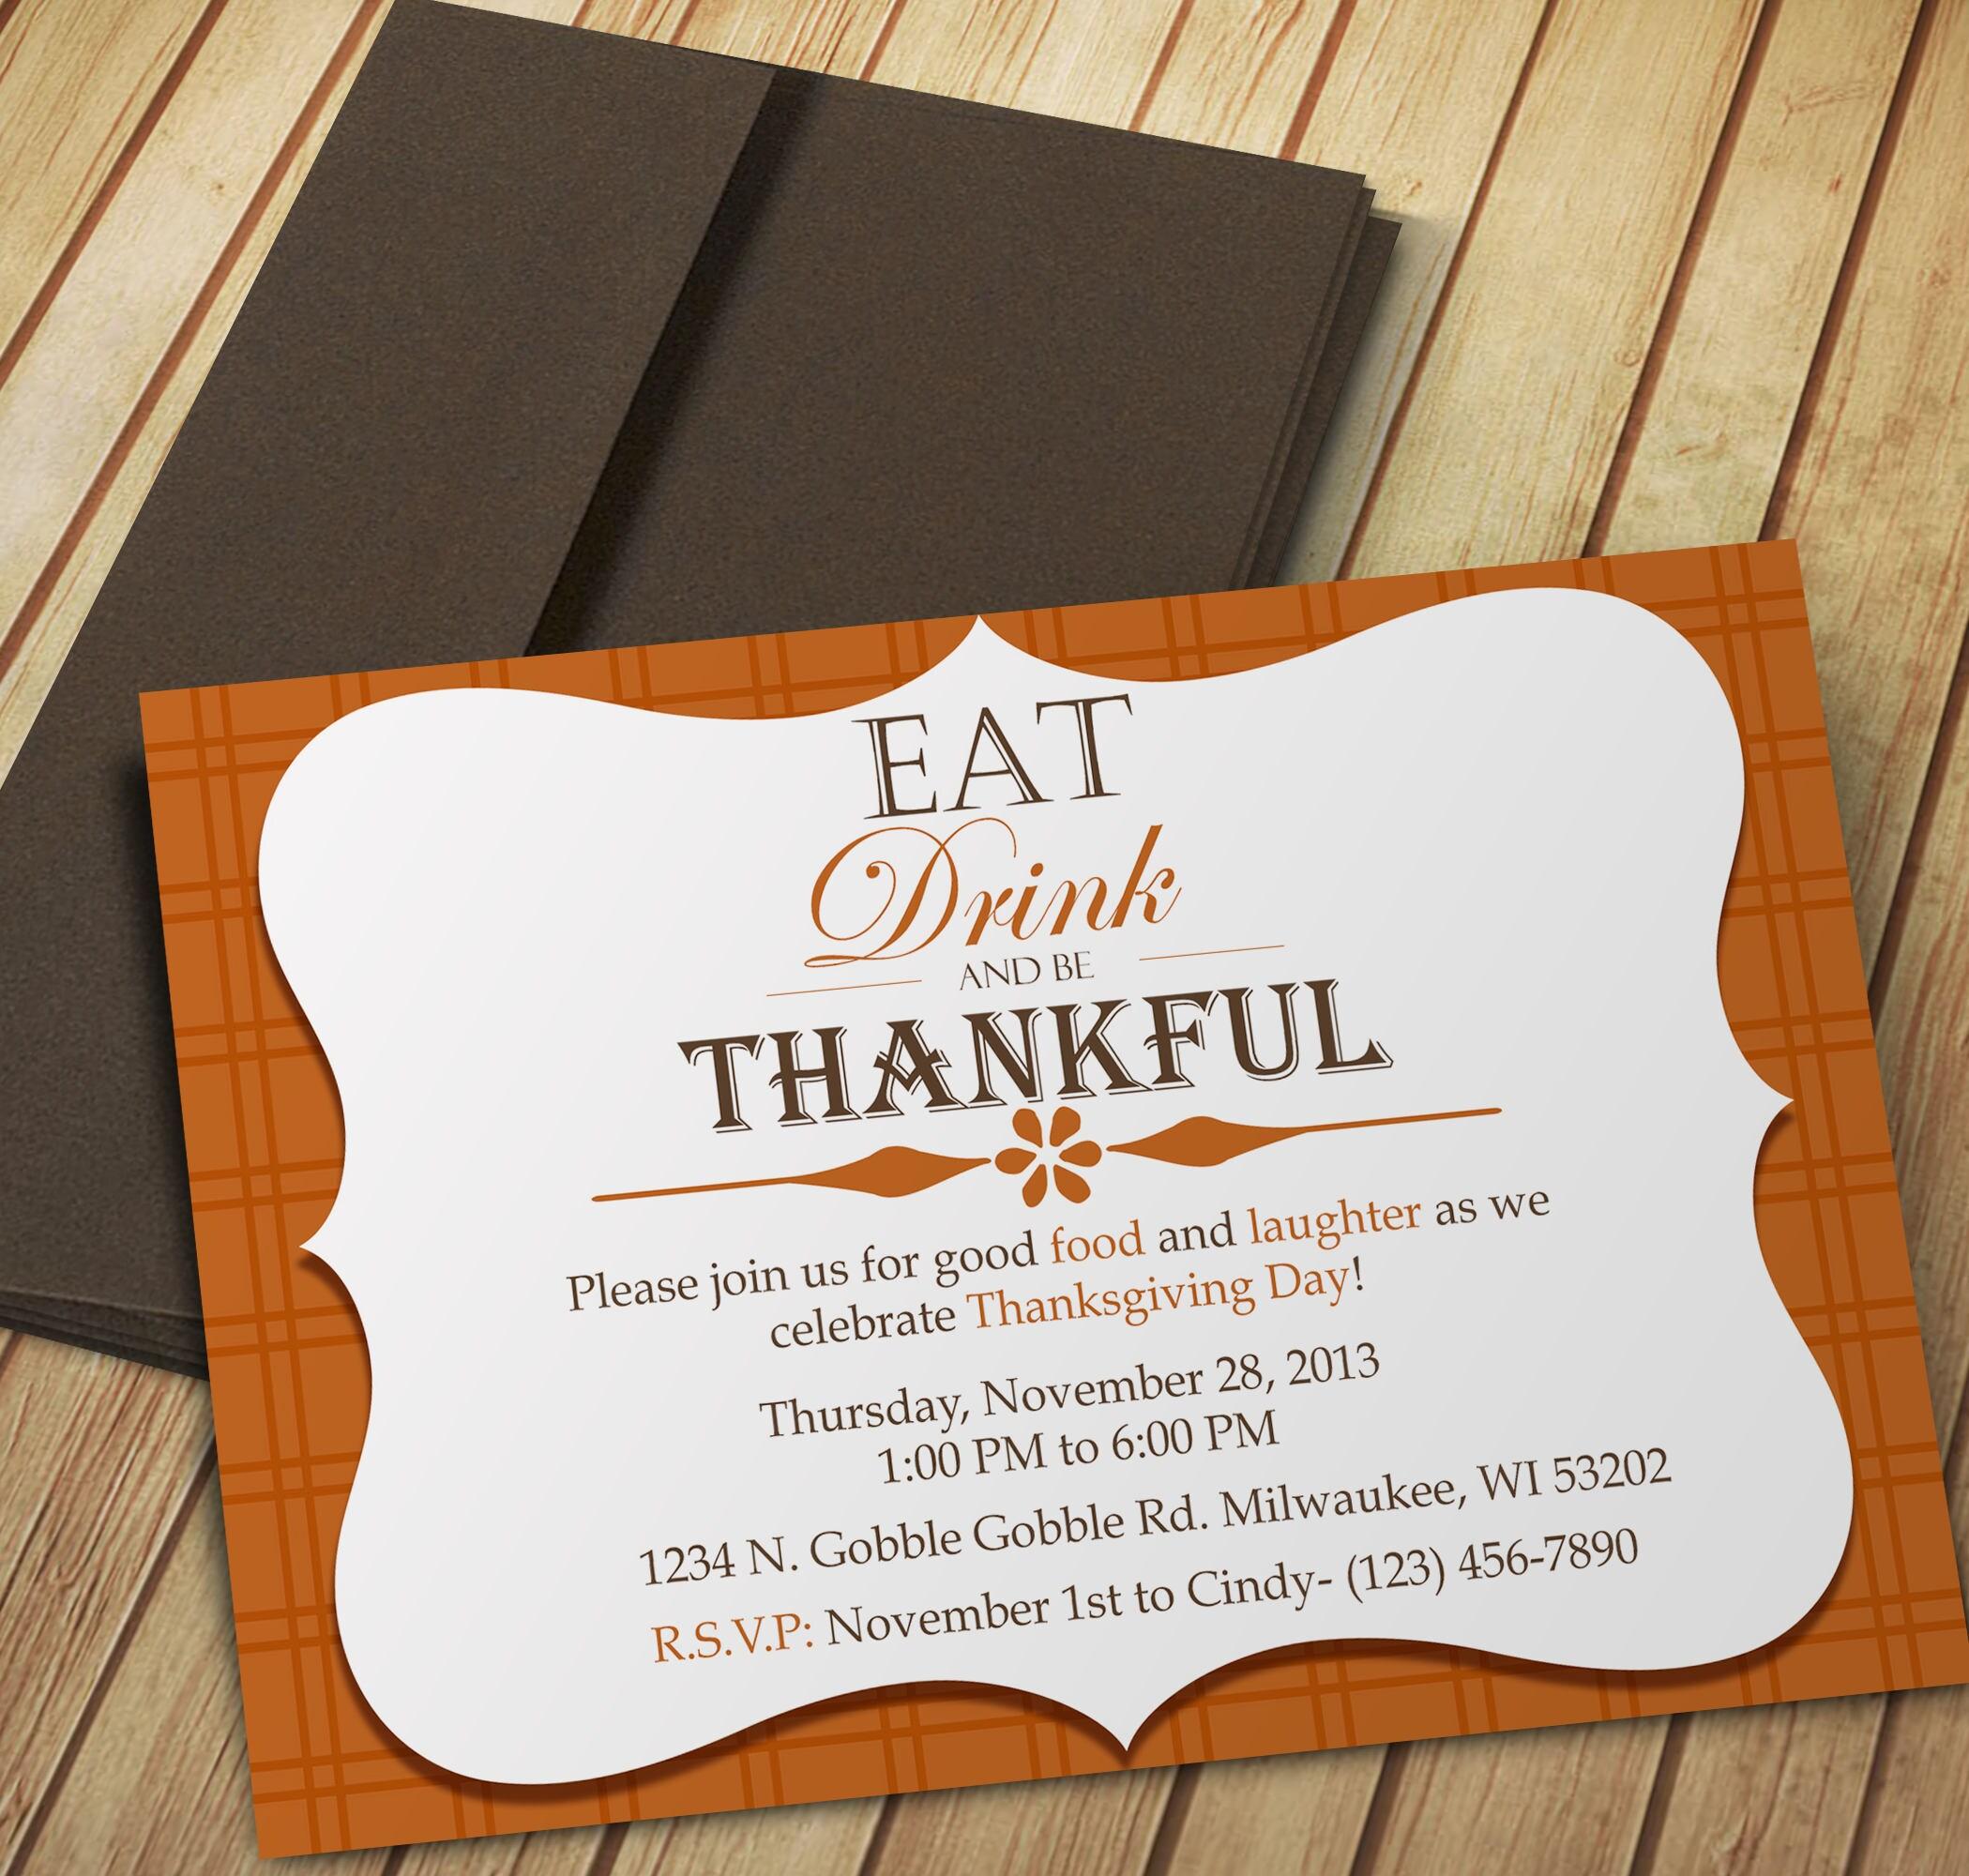 Thanksgiving Invitation Template Word from i.etsystatic.com